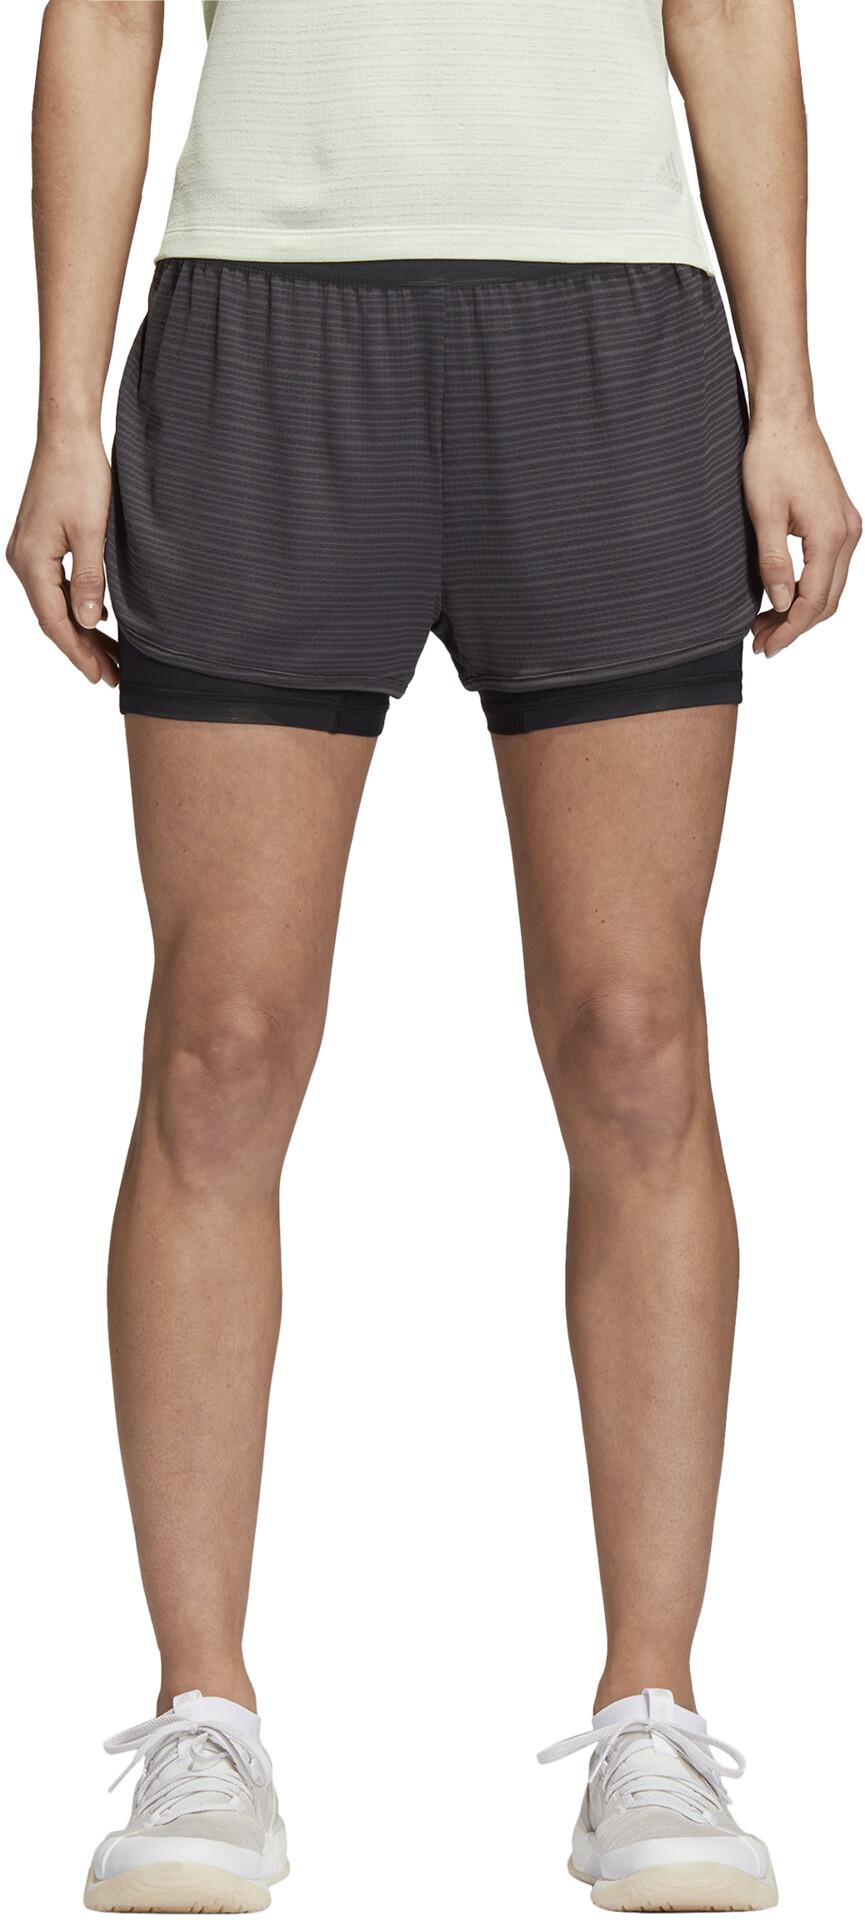 Mujer 2in1 Running Pantalones Adidas es Chill Gris Campz Cortos POwXZppq